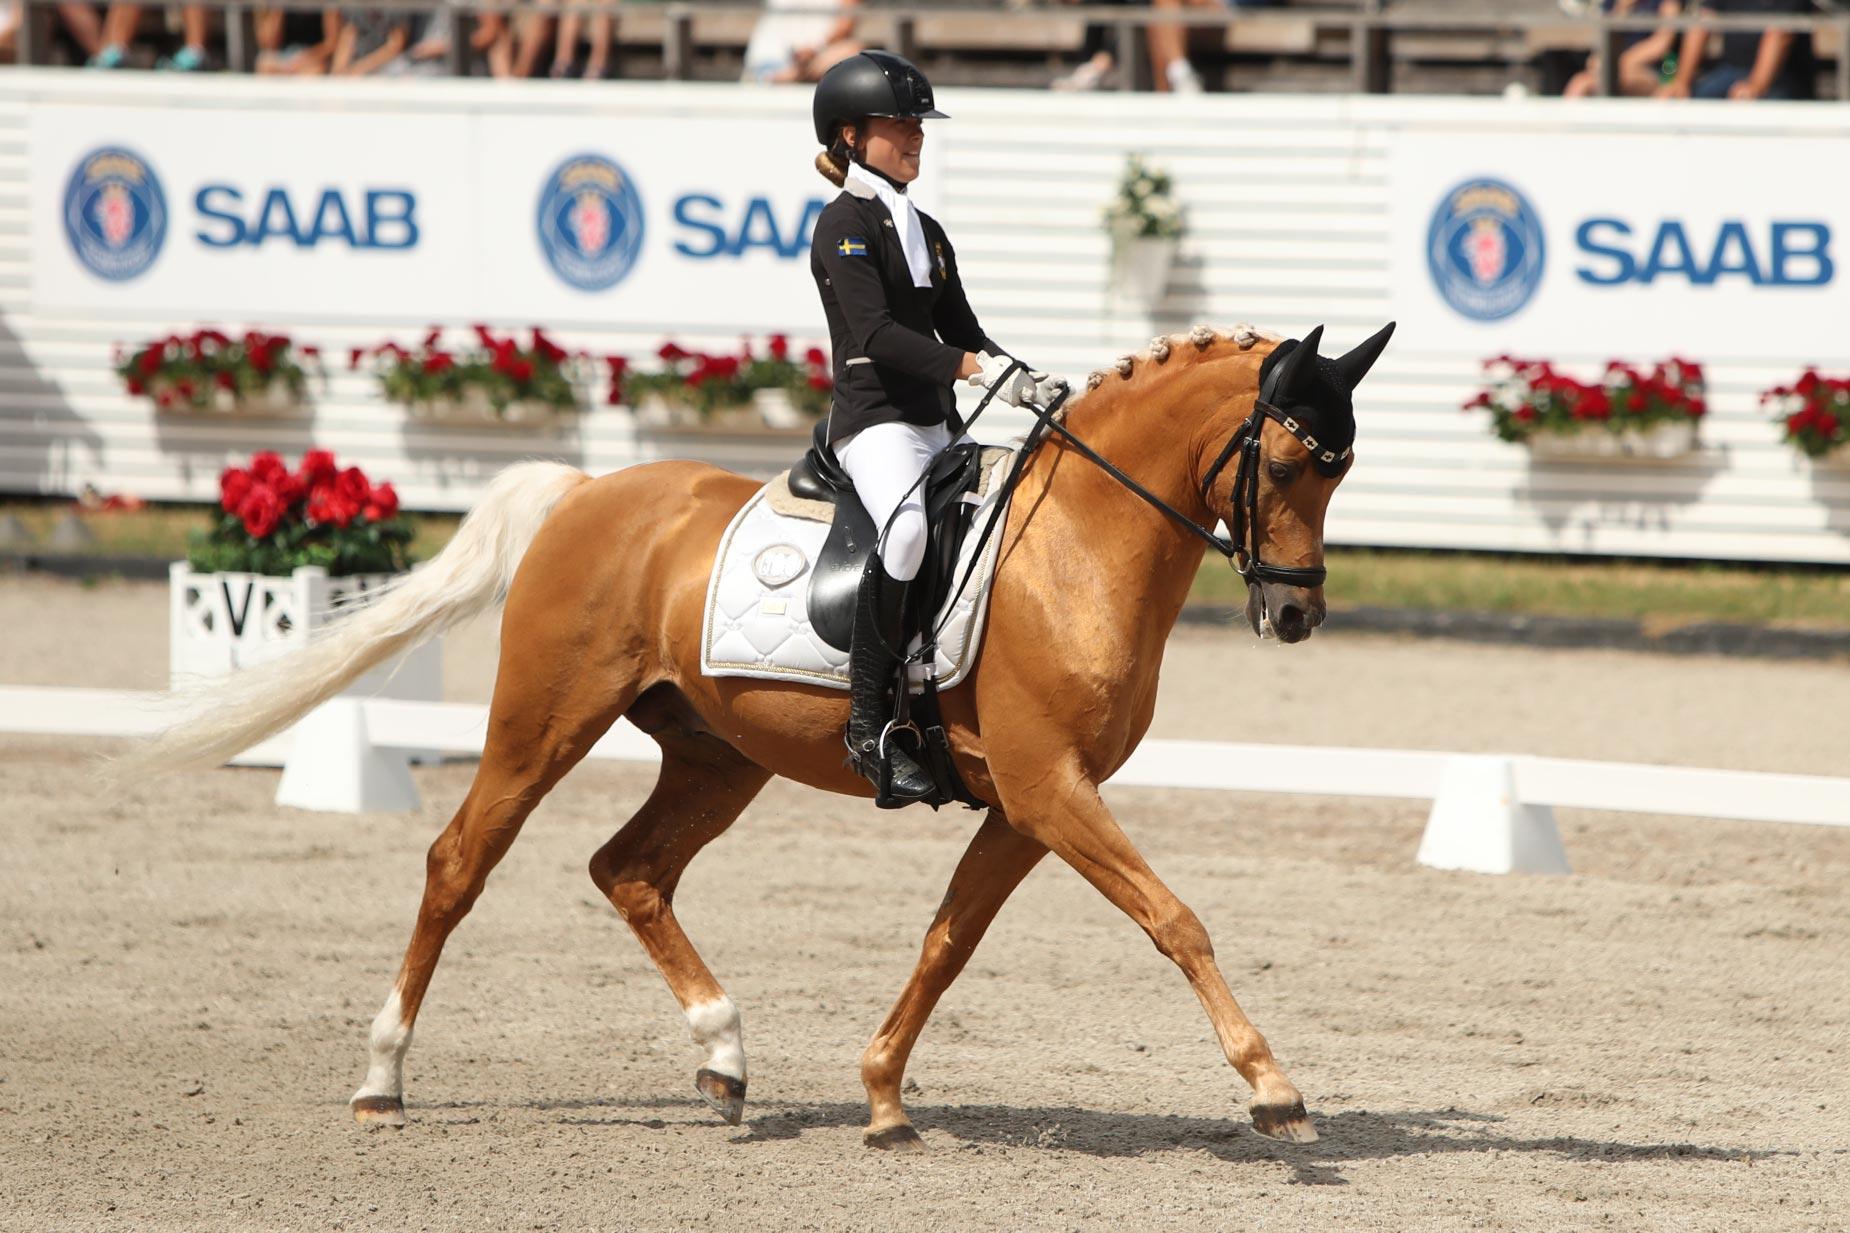 Emilia Berglund Bergåkra - Jarno RP 145 (ASRP hingst f-01 e Coelenhage's Purioso-Coelenhage's Let's be the Best, uppf R. Bonhof) 71,417%